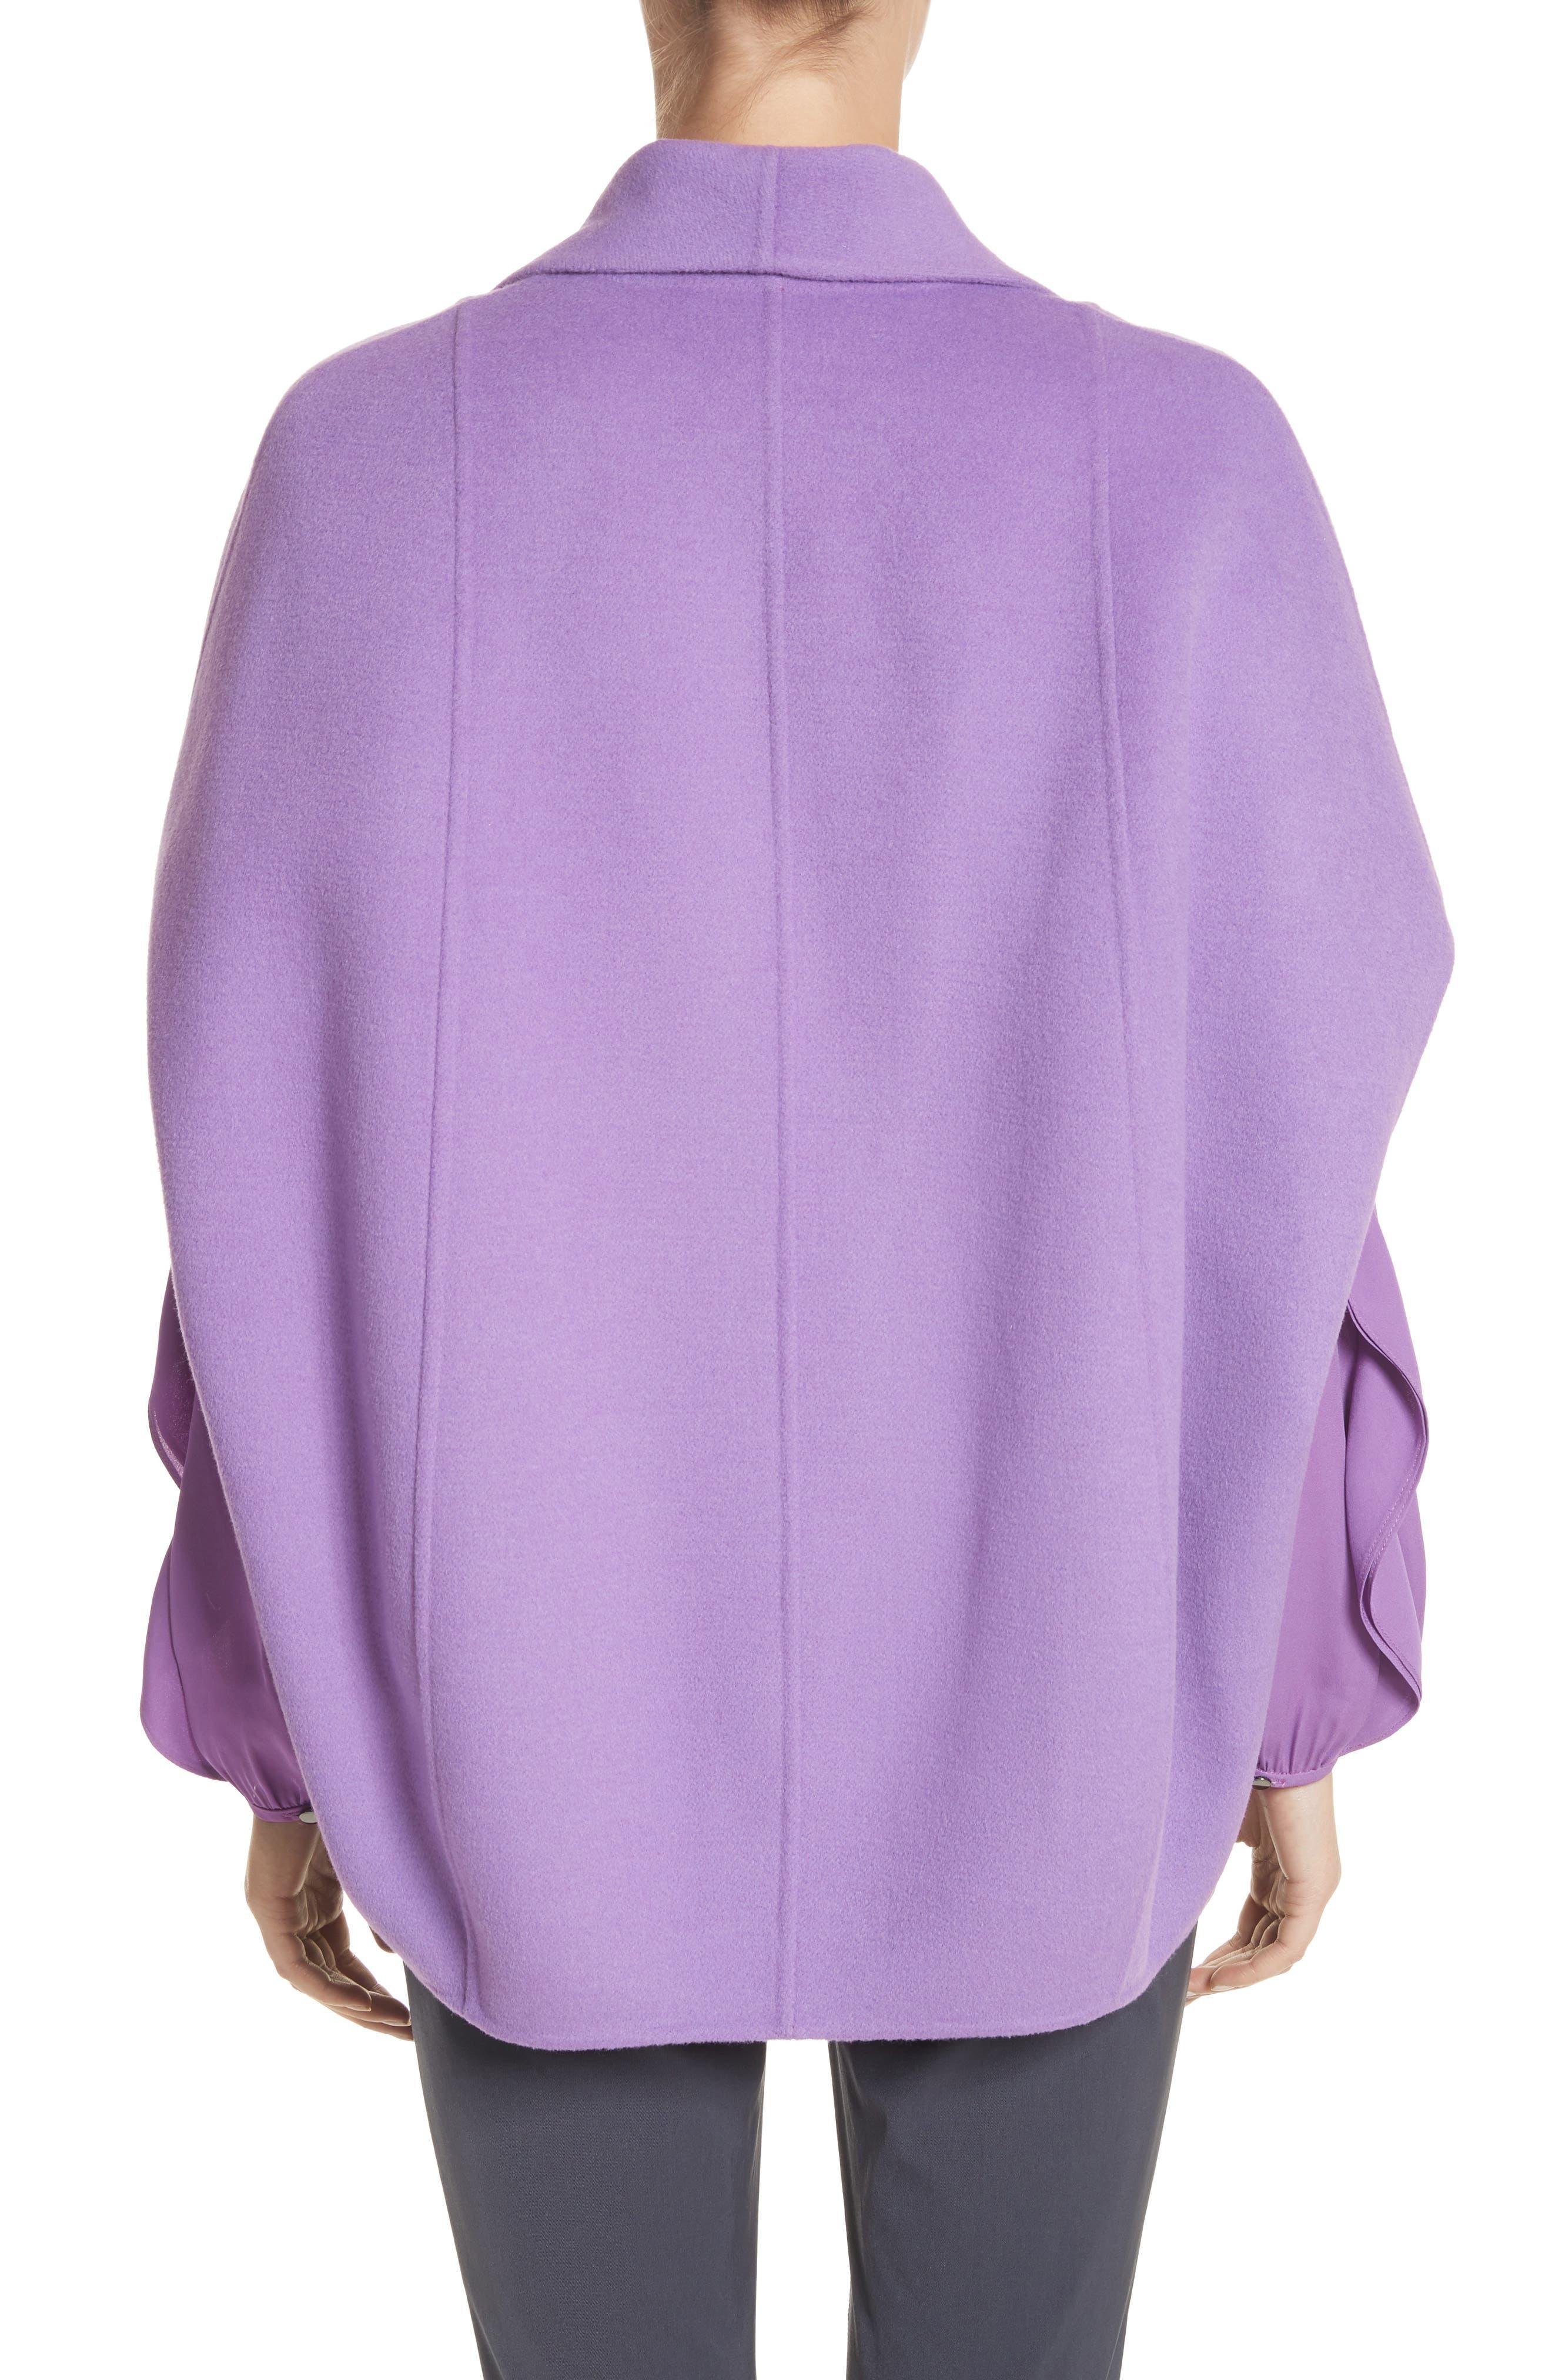 Double Face Wool & Angora Blend Jacket,                             Alternate thumbnail 2, color,                             550